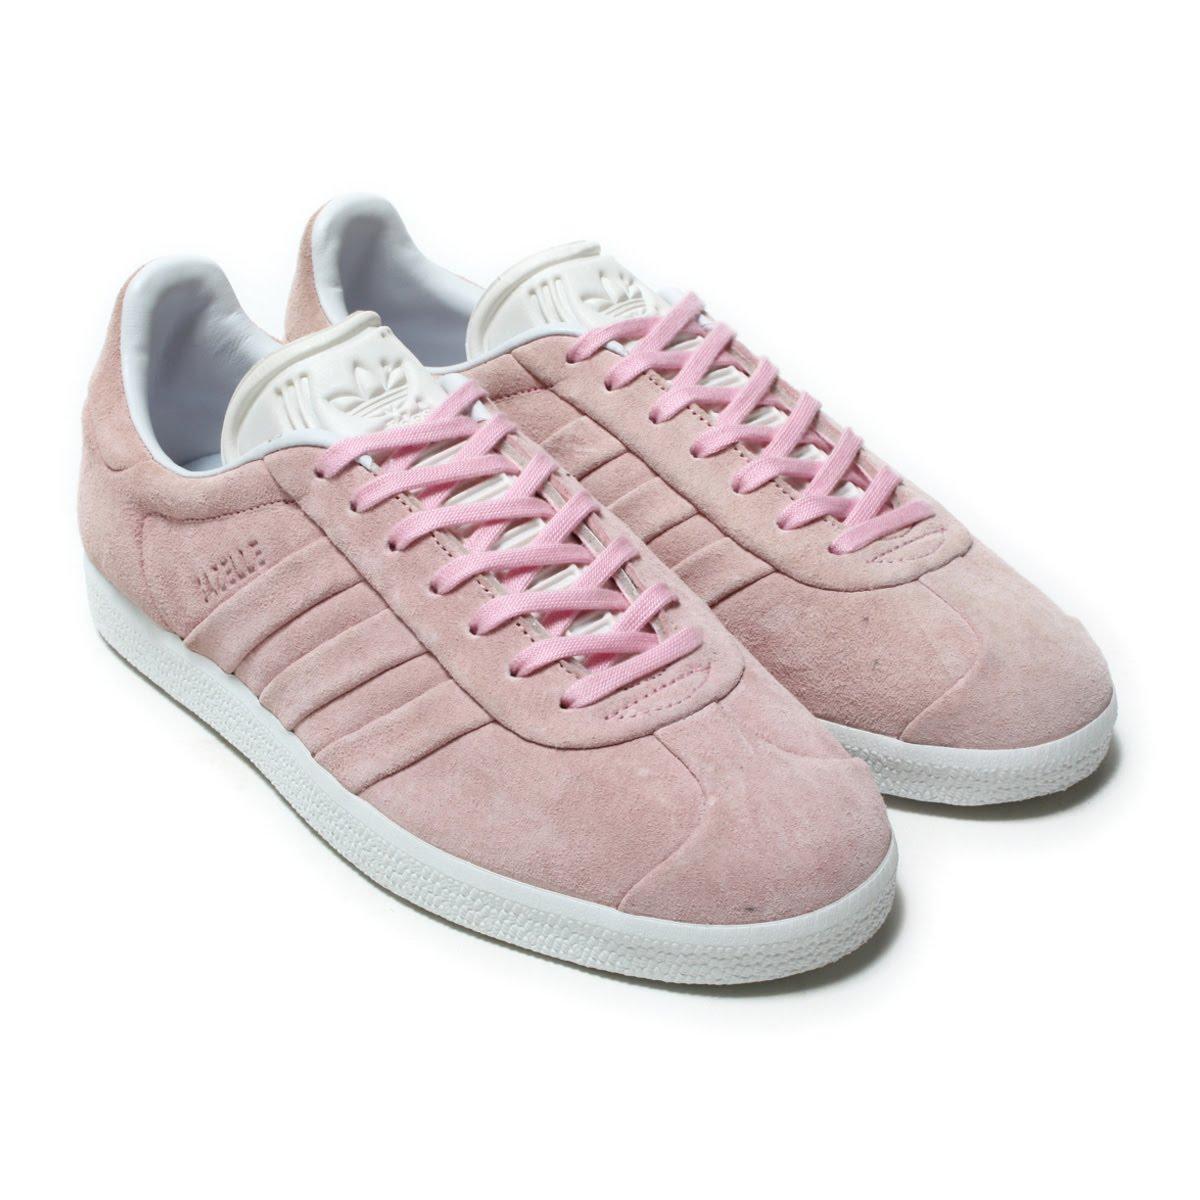 adidas Originals GAZELLE STITCH AND TURN W (アディダス オリジナルス ガゼル ステッチ アンド ターン W)Wonder Pink/Wonder Pink/Ftwr White【レディース スニーカー】18SS-S